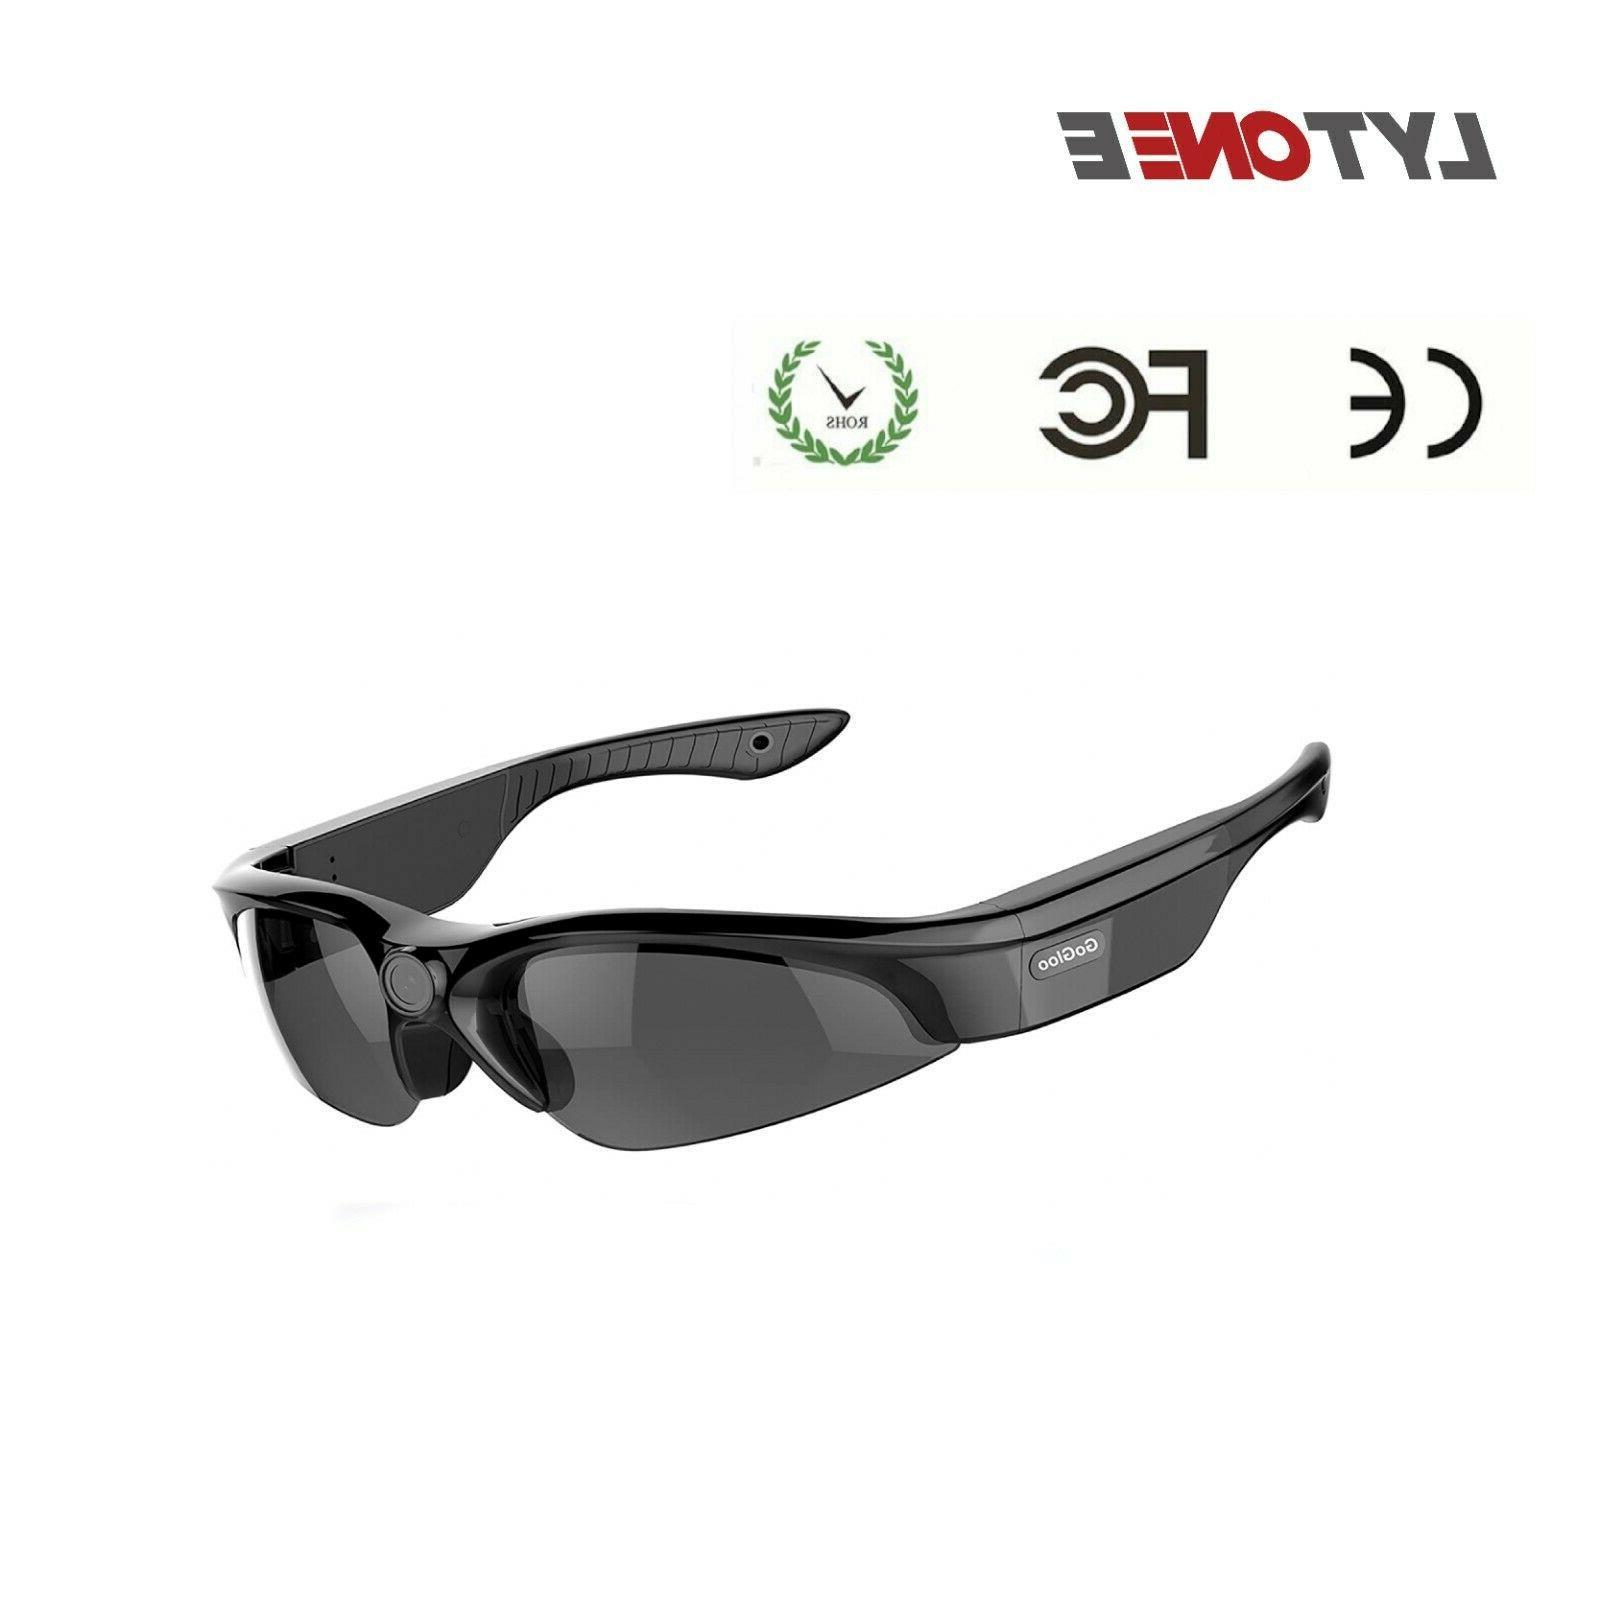 HD Glasses Video Camera DVR Sports Camera 30fps 150 Degree